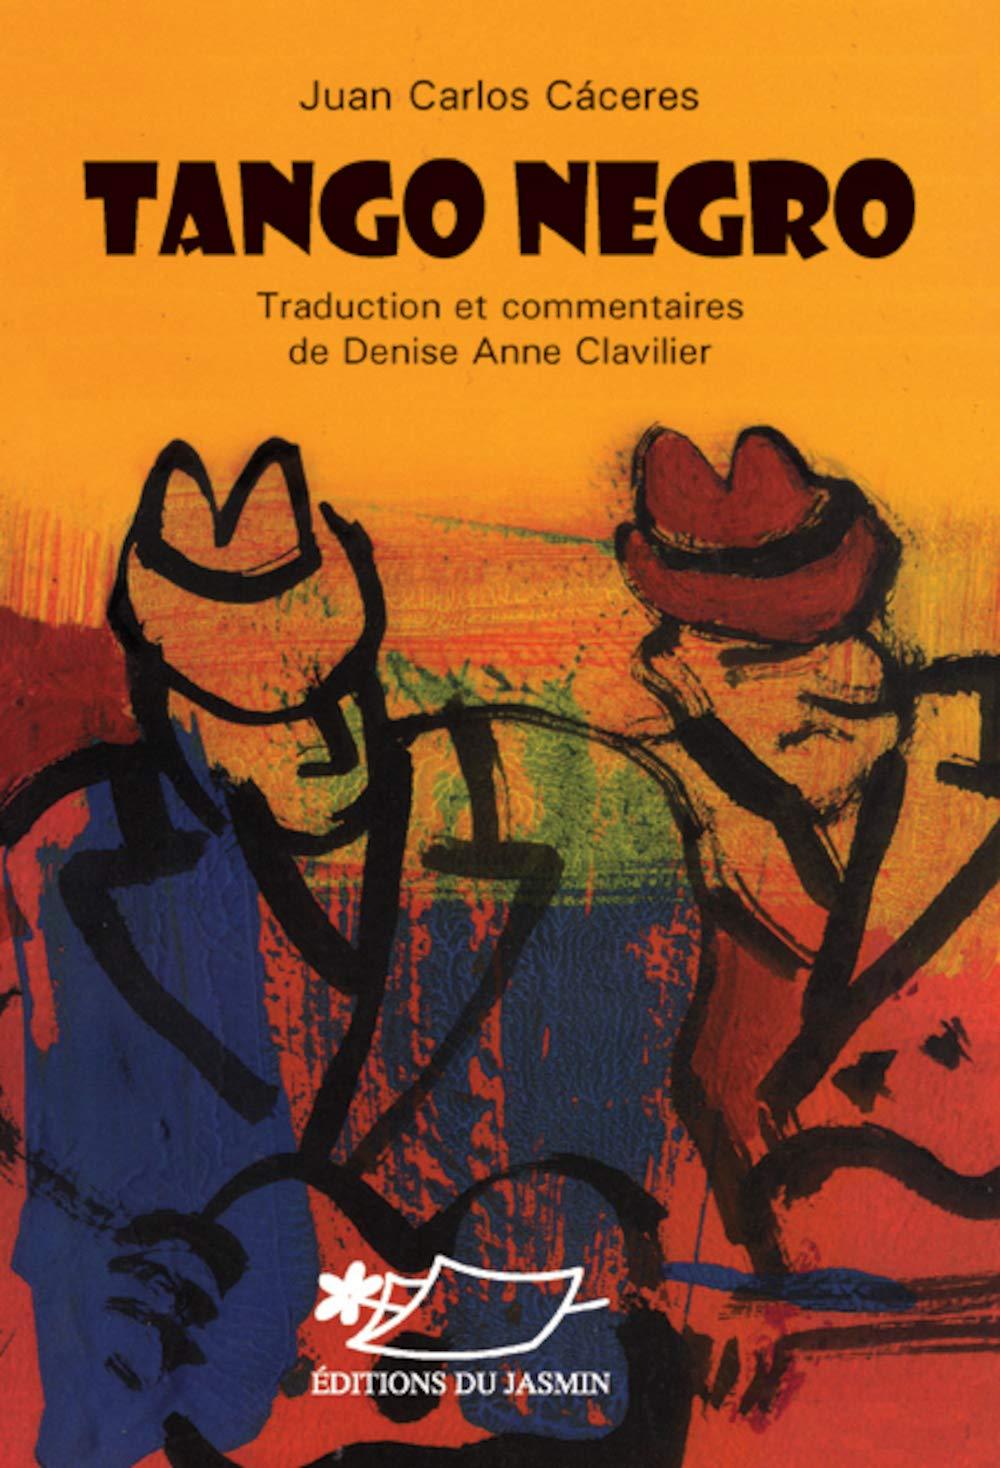 tango negro 2